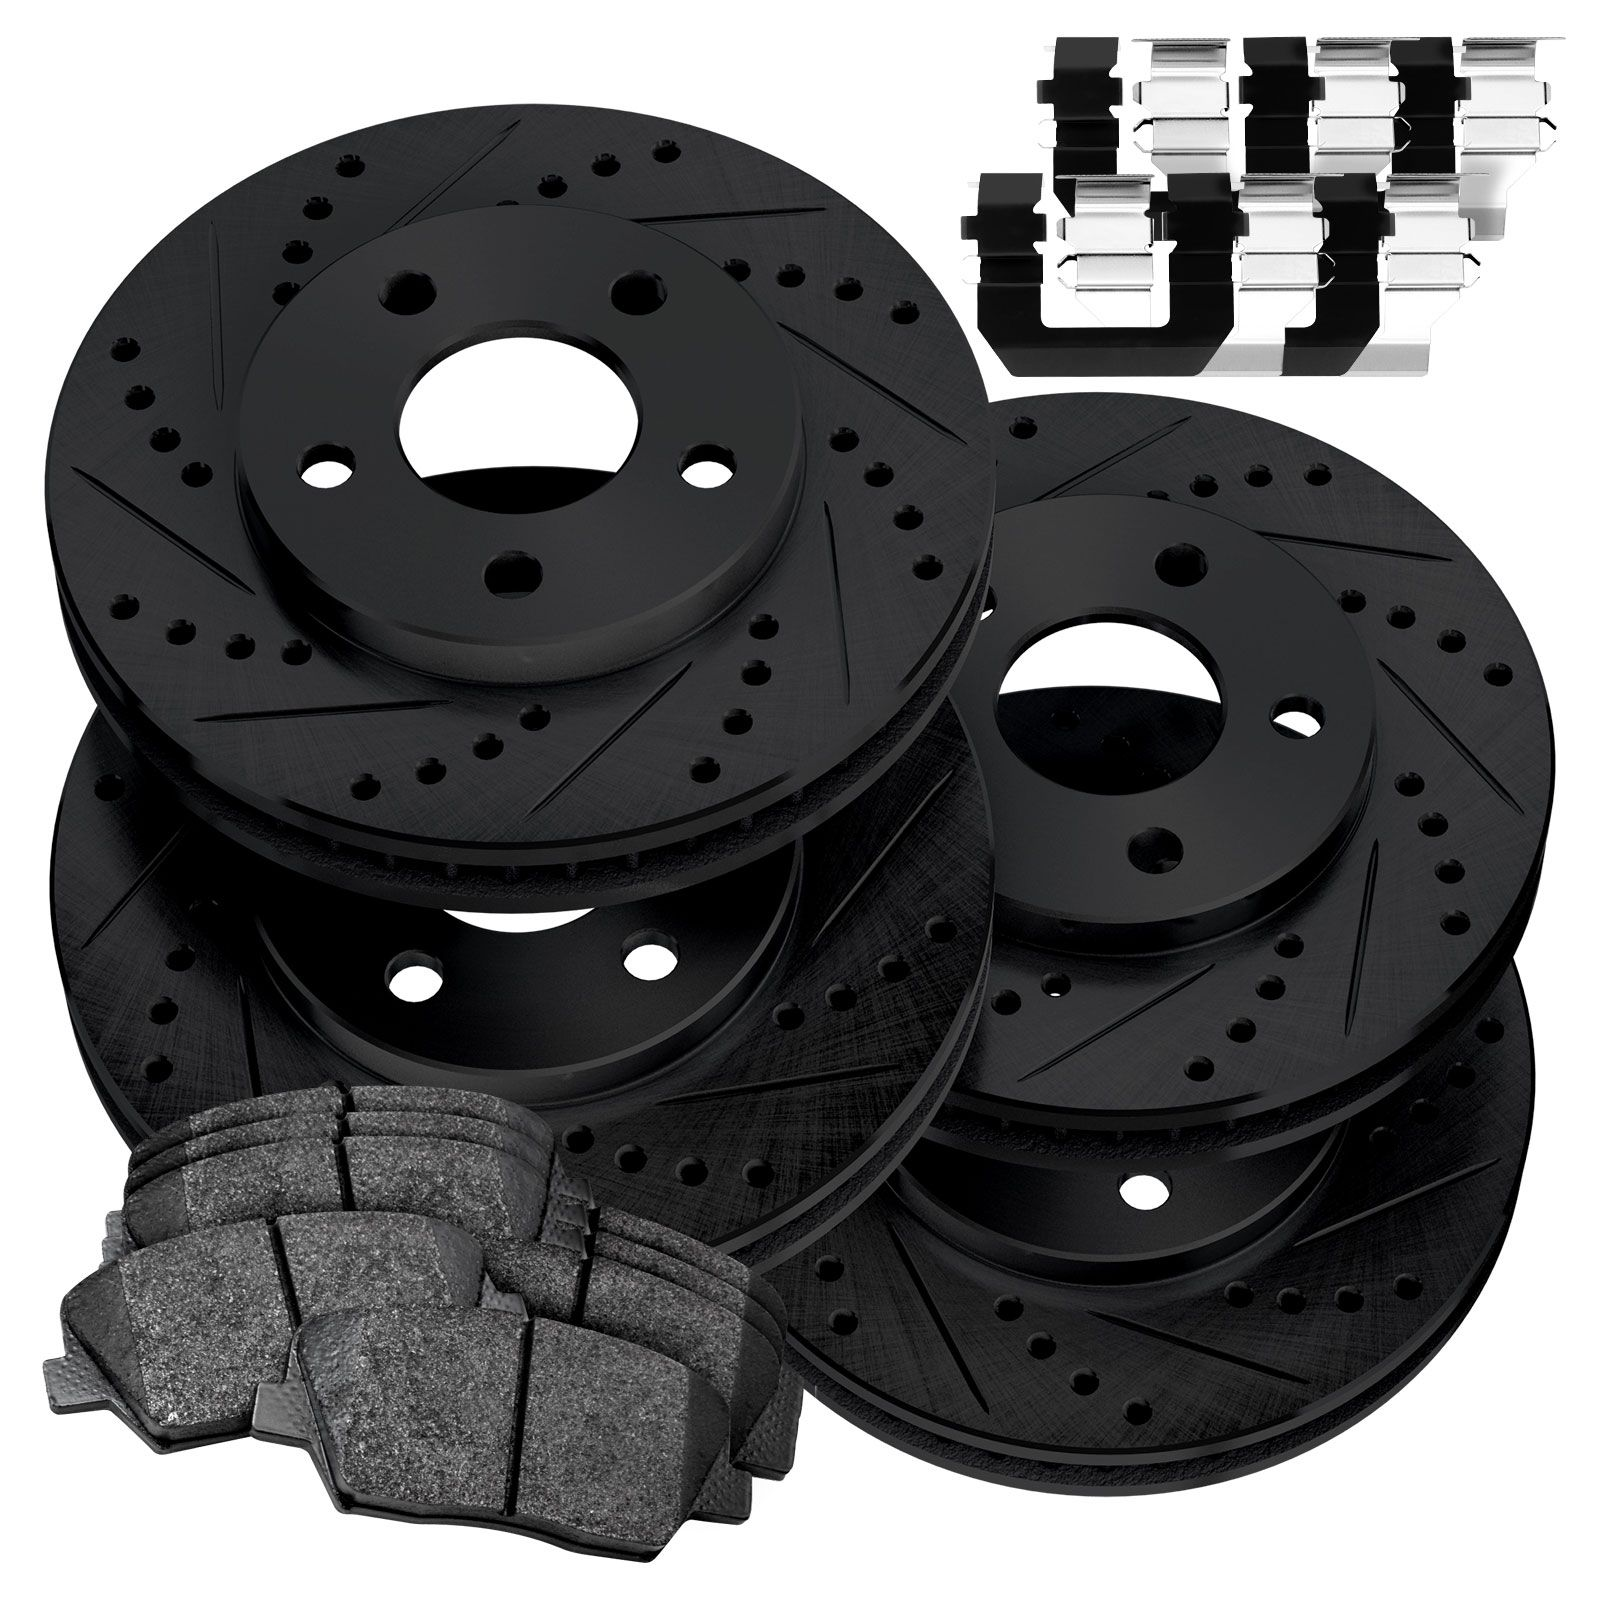 Fits 2007-2015 Mazda CX-9 Front Black Drill Slot Brake Rotors+Ceramic Pads